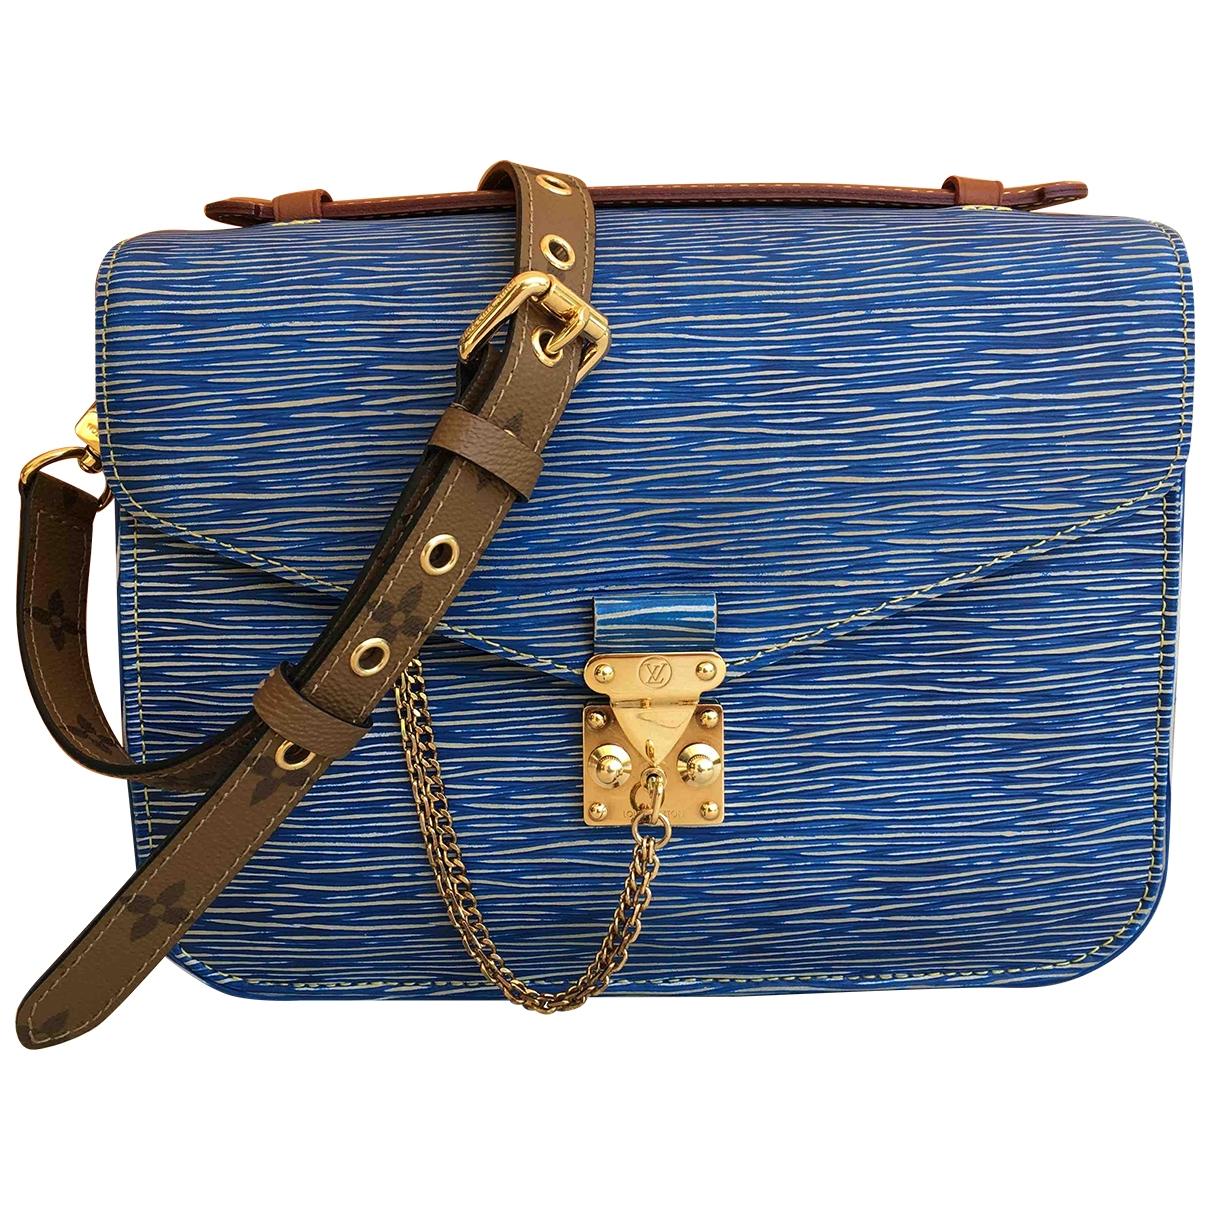 Louis Vuitton - Sac a main Metis pour femme en cuir - bleu